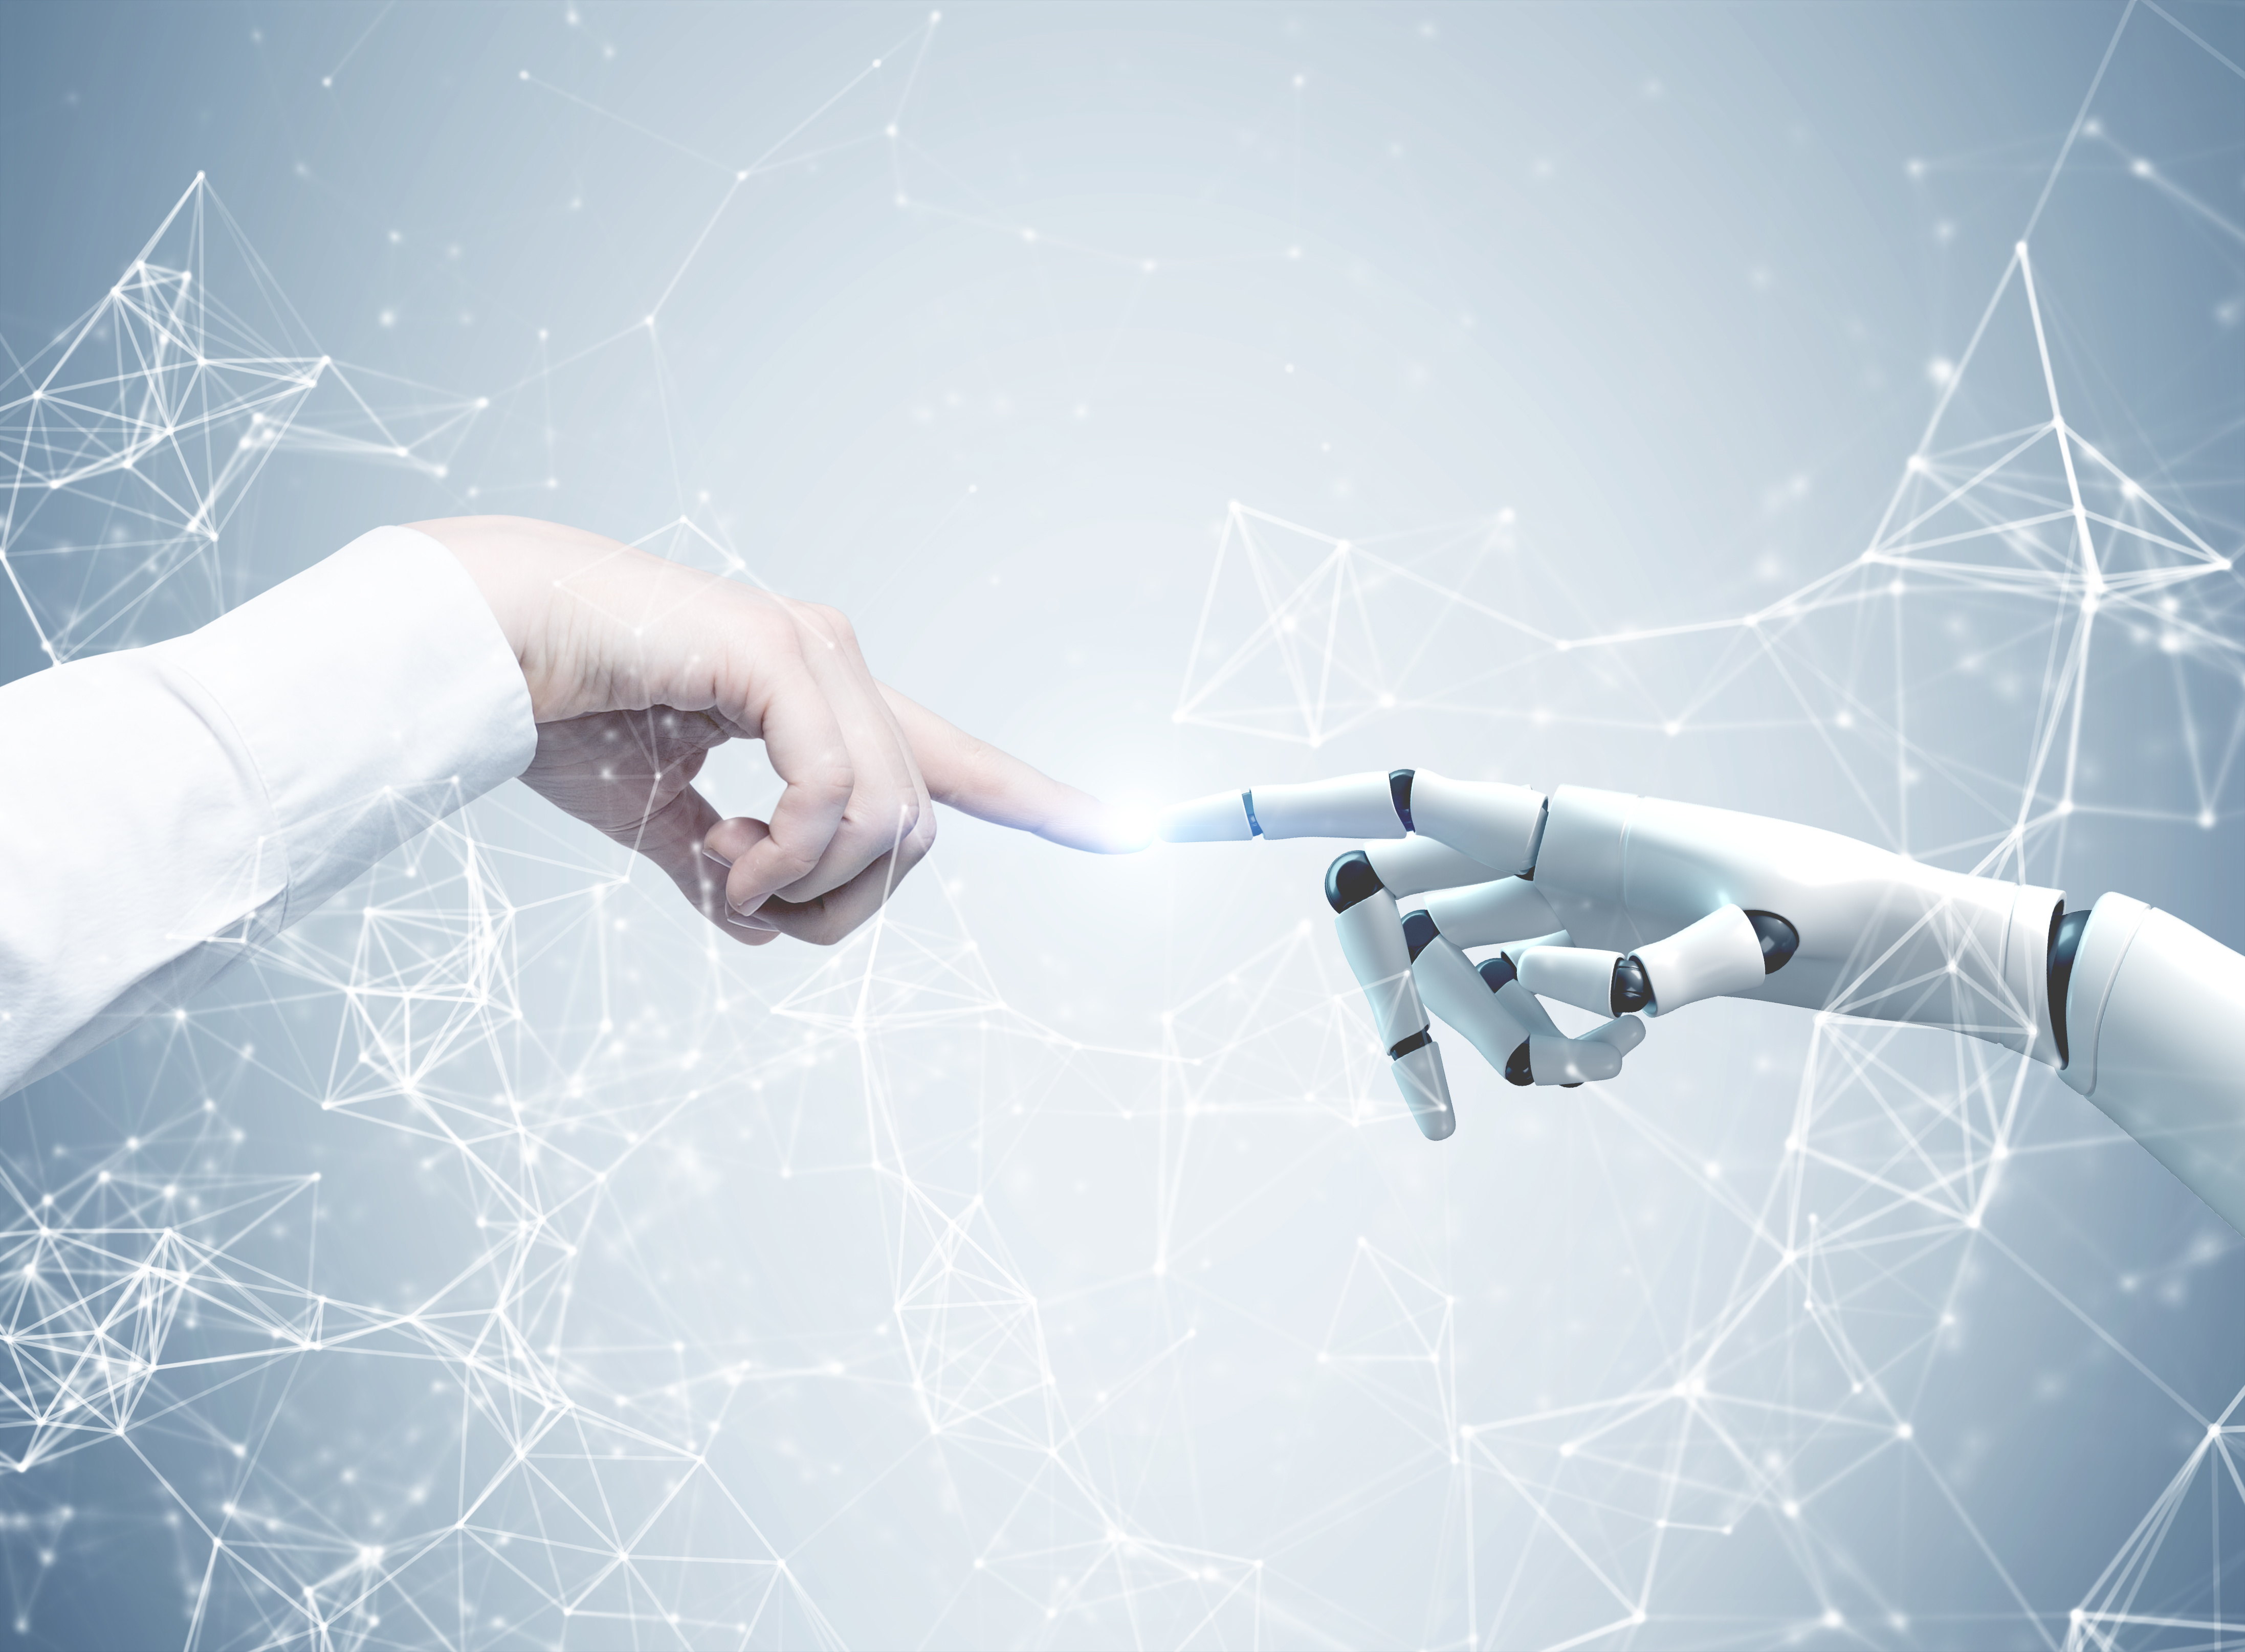 E_Q_digital_roboter_hand_berührung_davinci_innovativ_adobestock_ID201581385_standardlizenz_keinablaufdatum